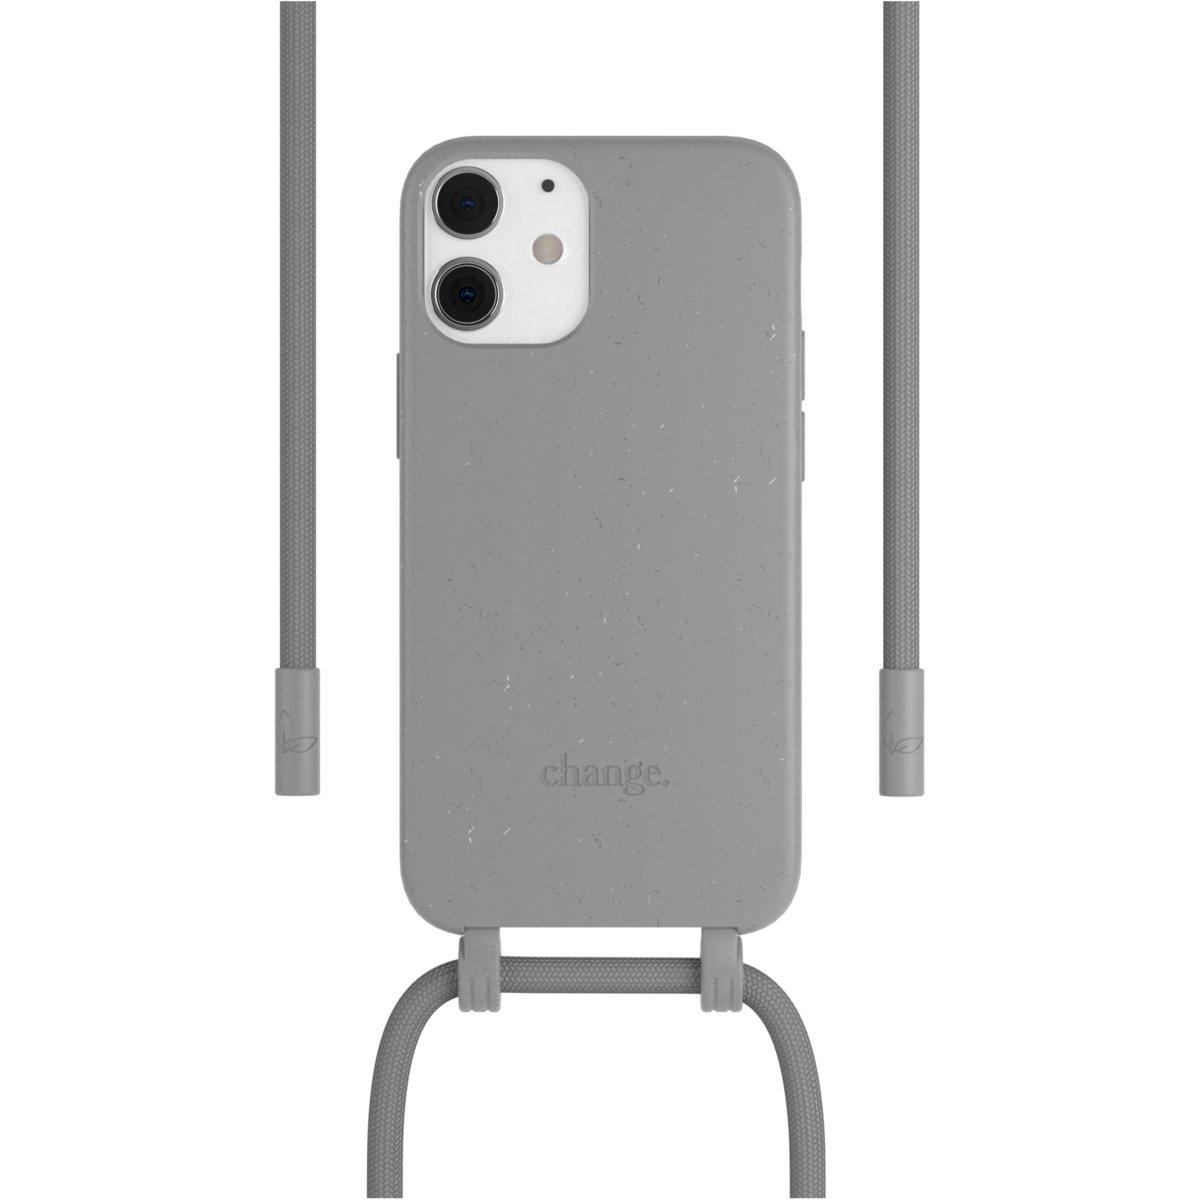 Woodcessories Change Case AM iPhone 12 Mini - grey